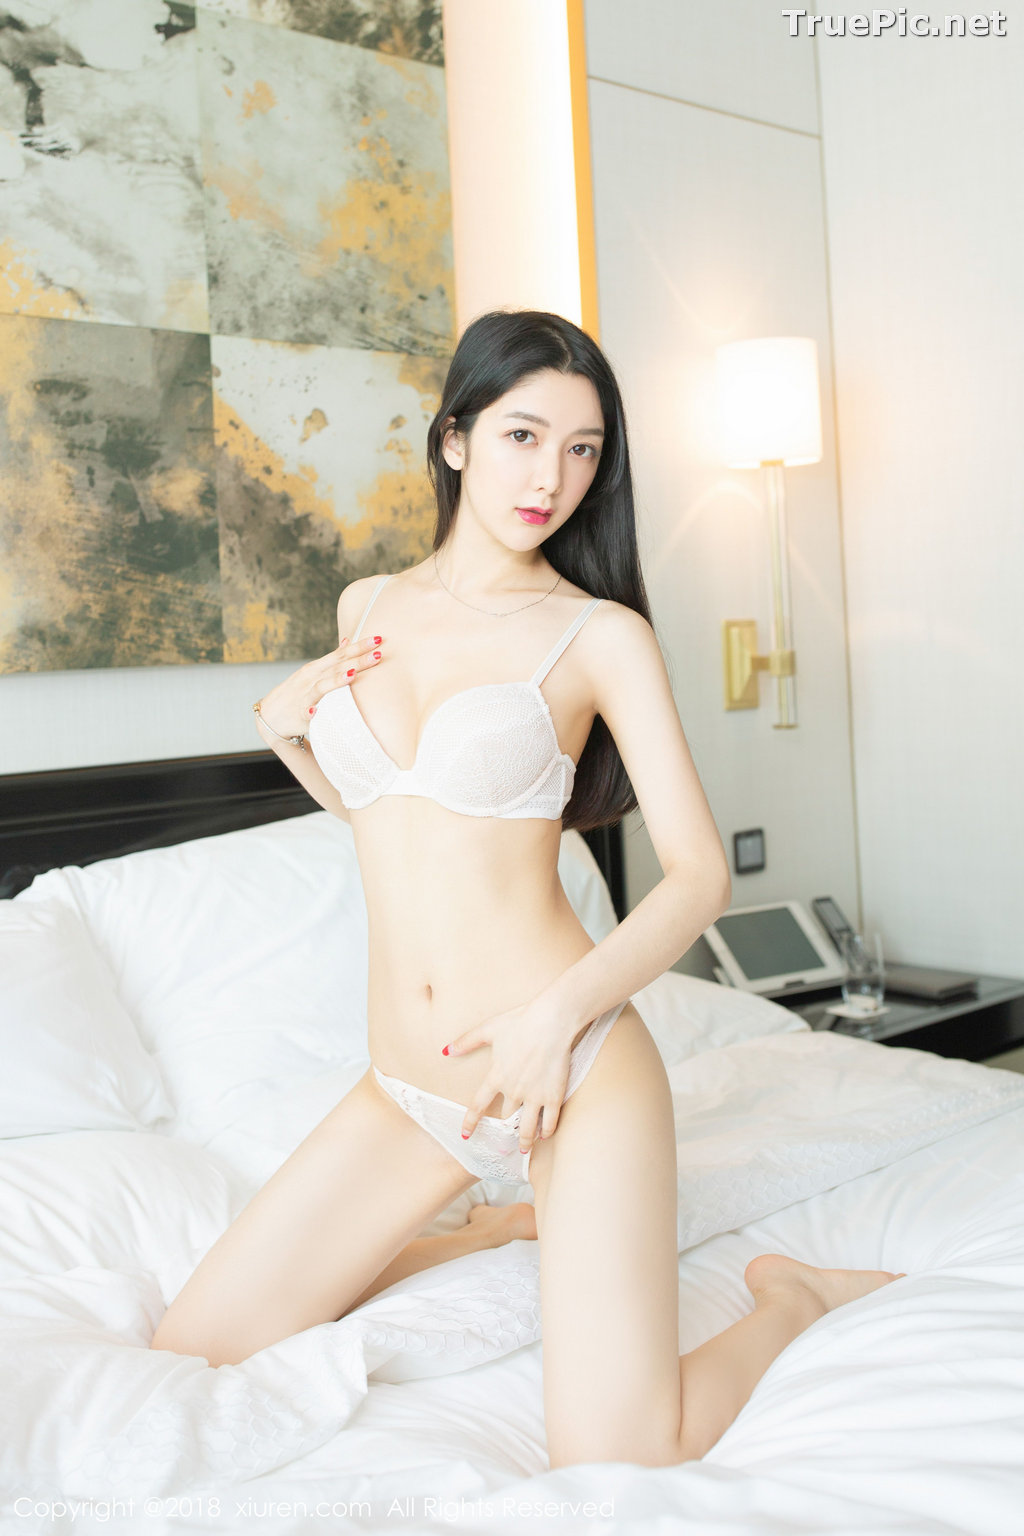 Image XIUREN No.1141 - Chinese Model - Xiao Reba (Angela小热巴) - Sexy Dress Tonight - TruePic.net - Picture-60